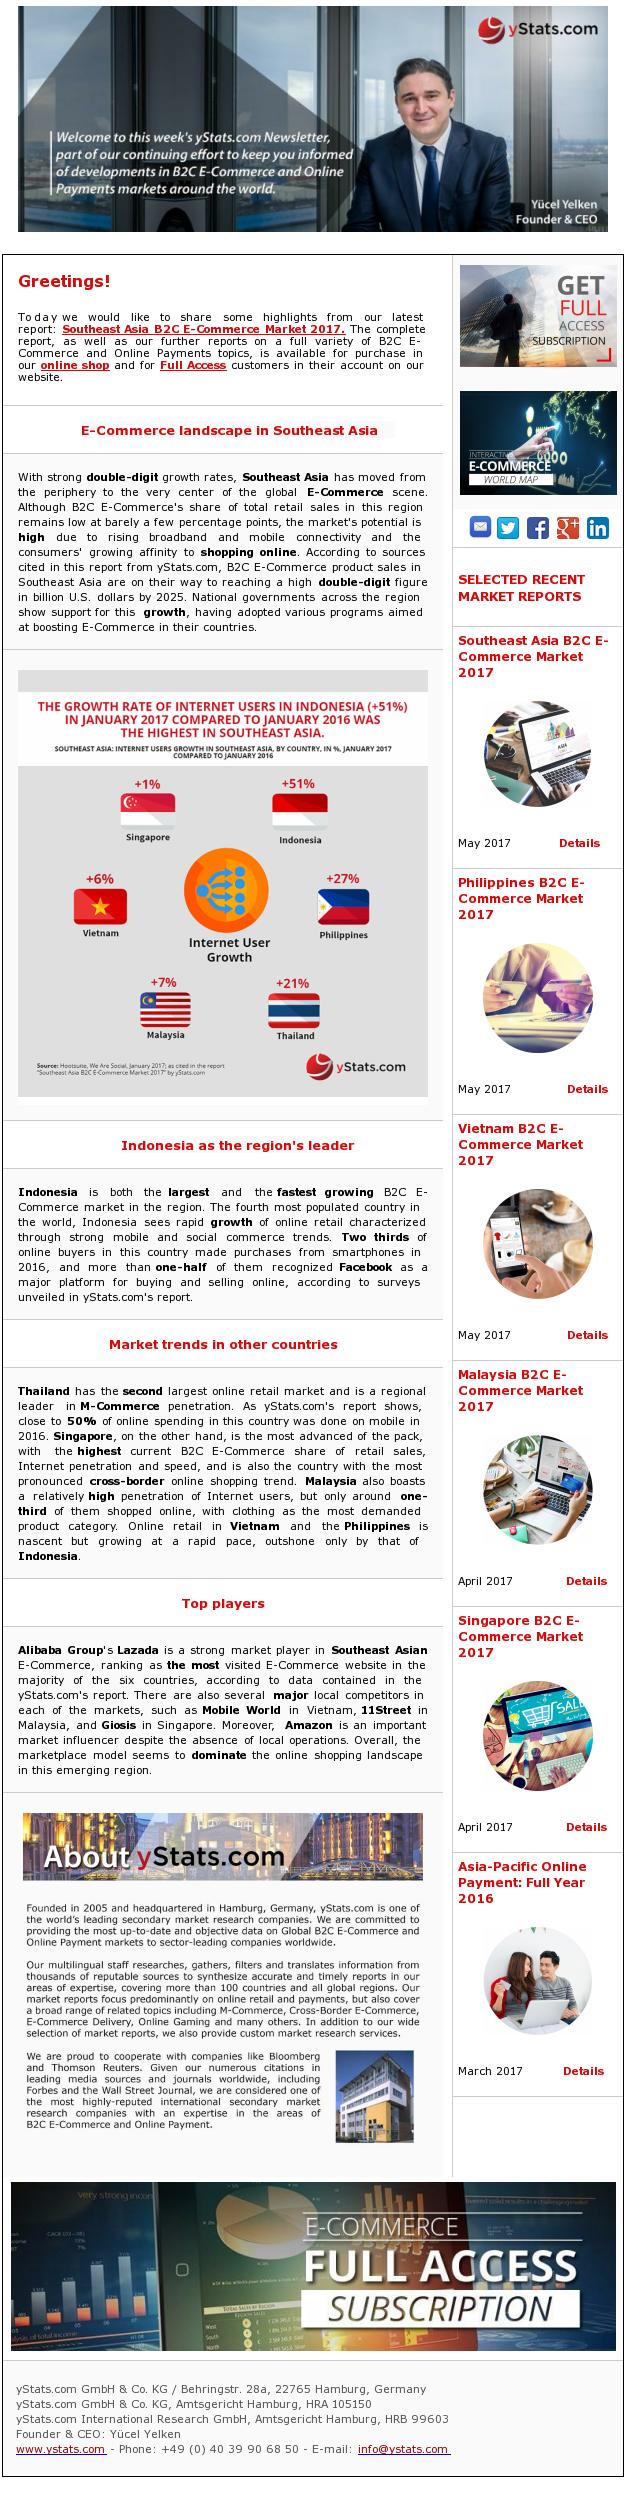 https://www.ystats.com/market-reports/southeast-asia-b2c-e-commerce-market-2017/